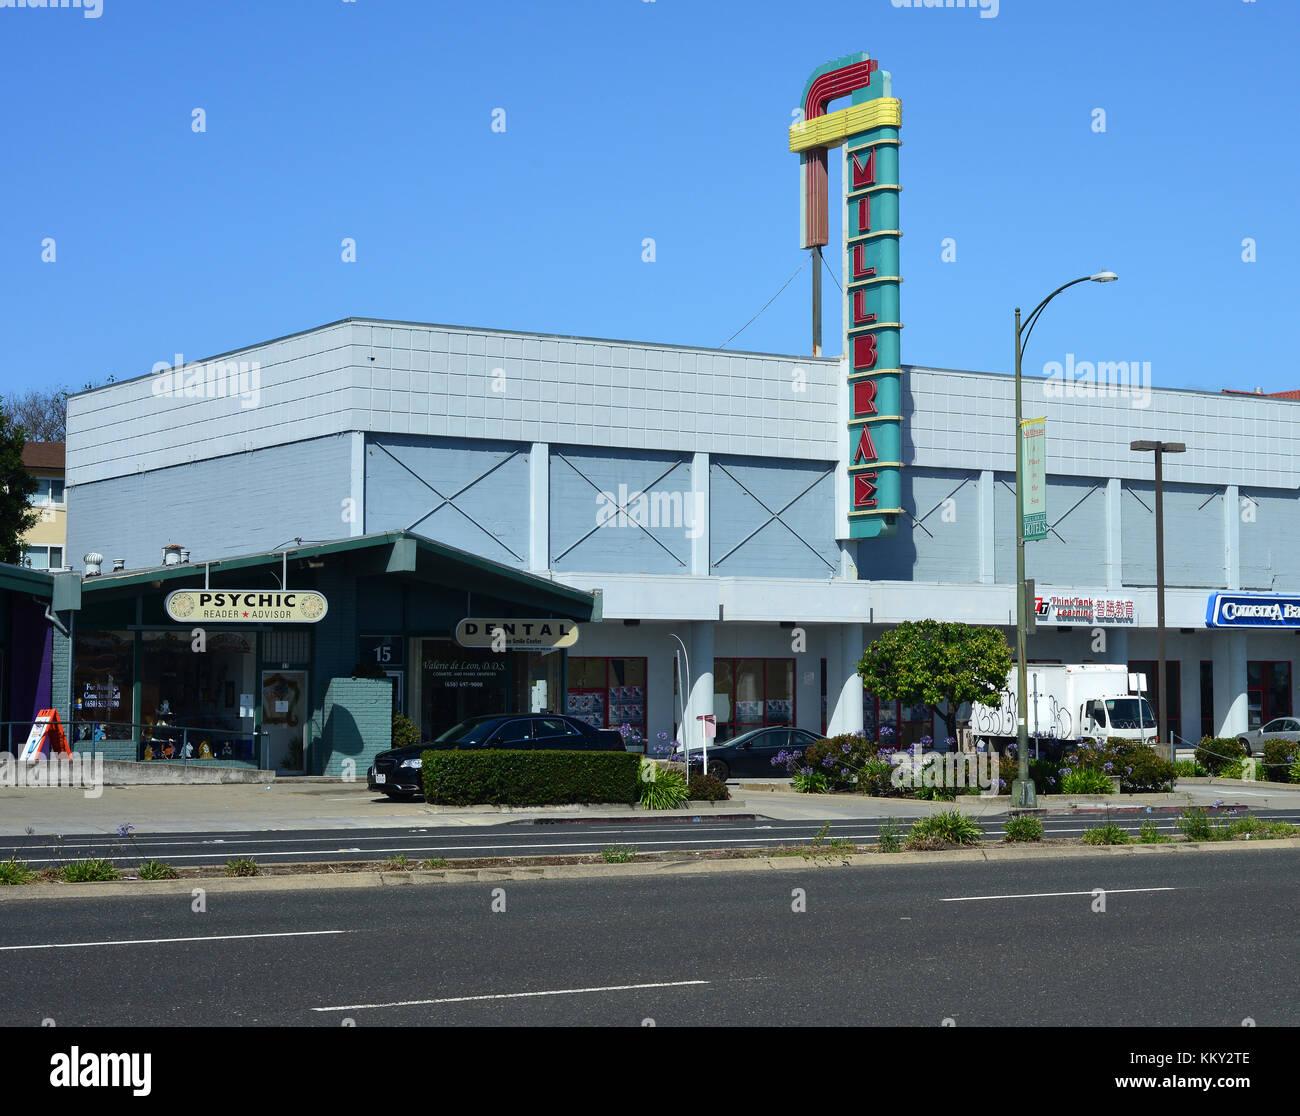 Shopping mall in Millbrae, San Francisco, California, USA - Stock Image